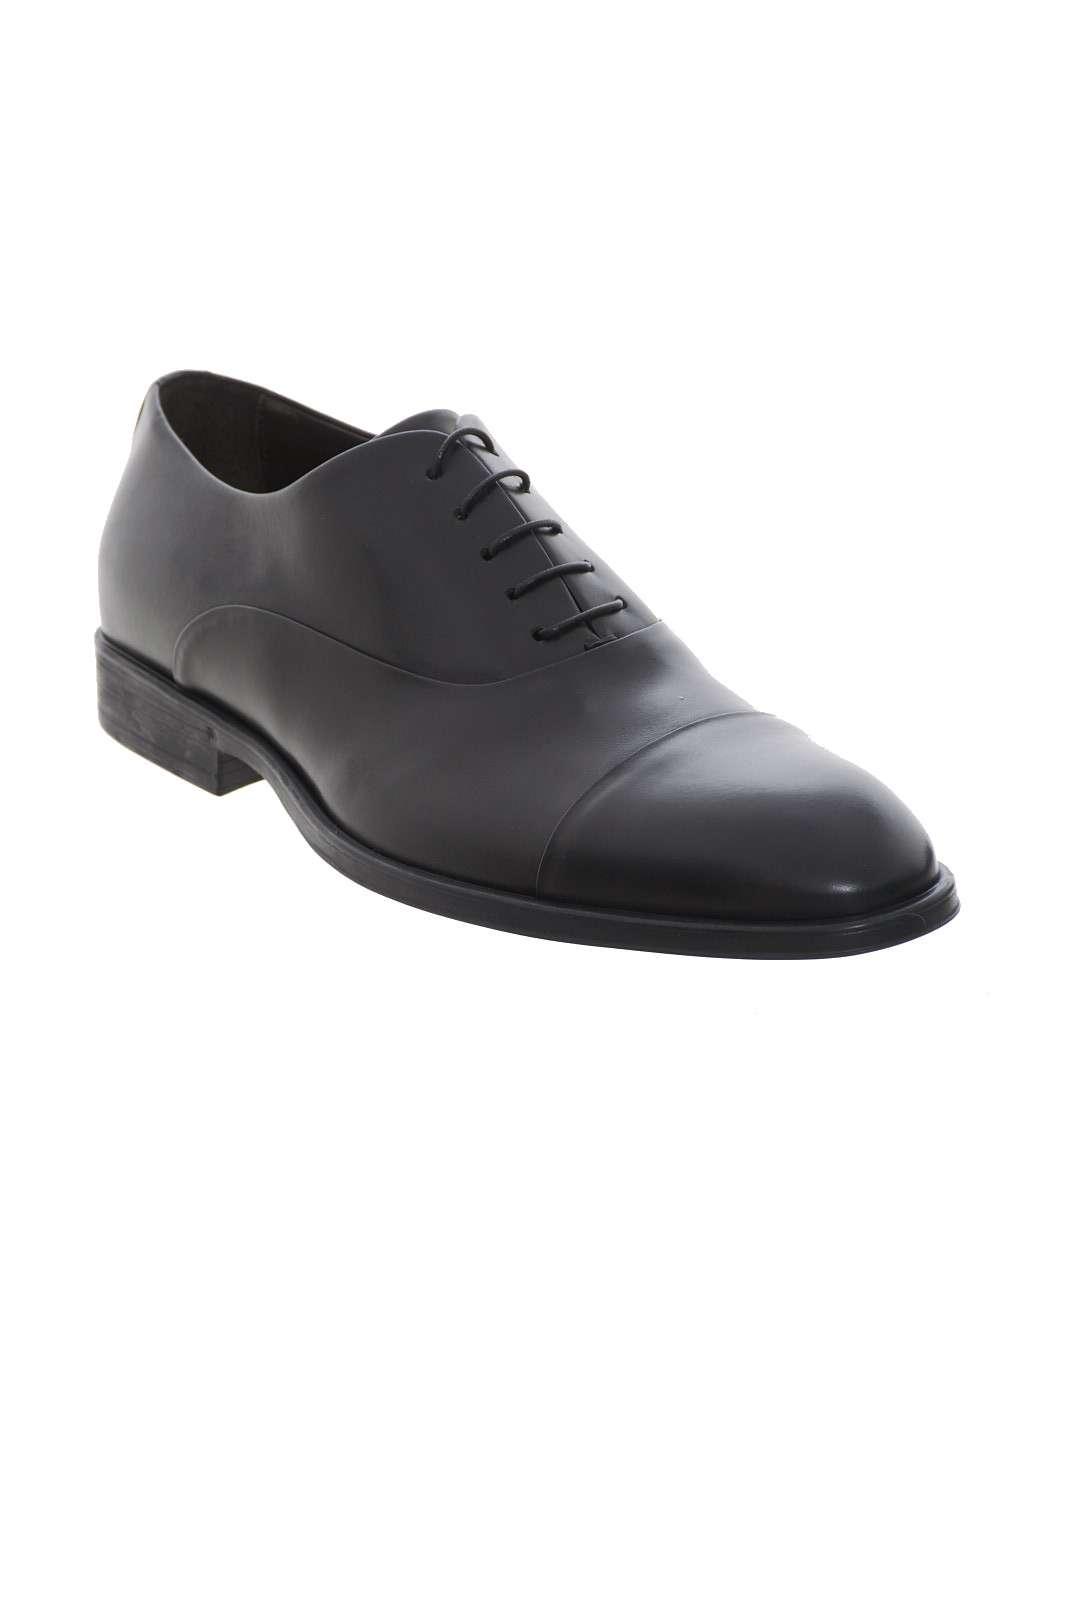 AI-outlet_parmax-scarpe-uomo-Corvari-8509